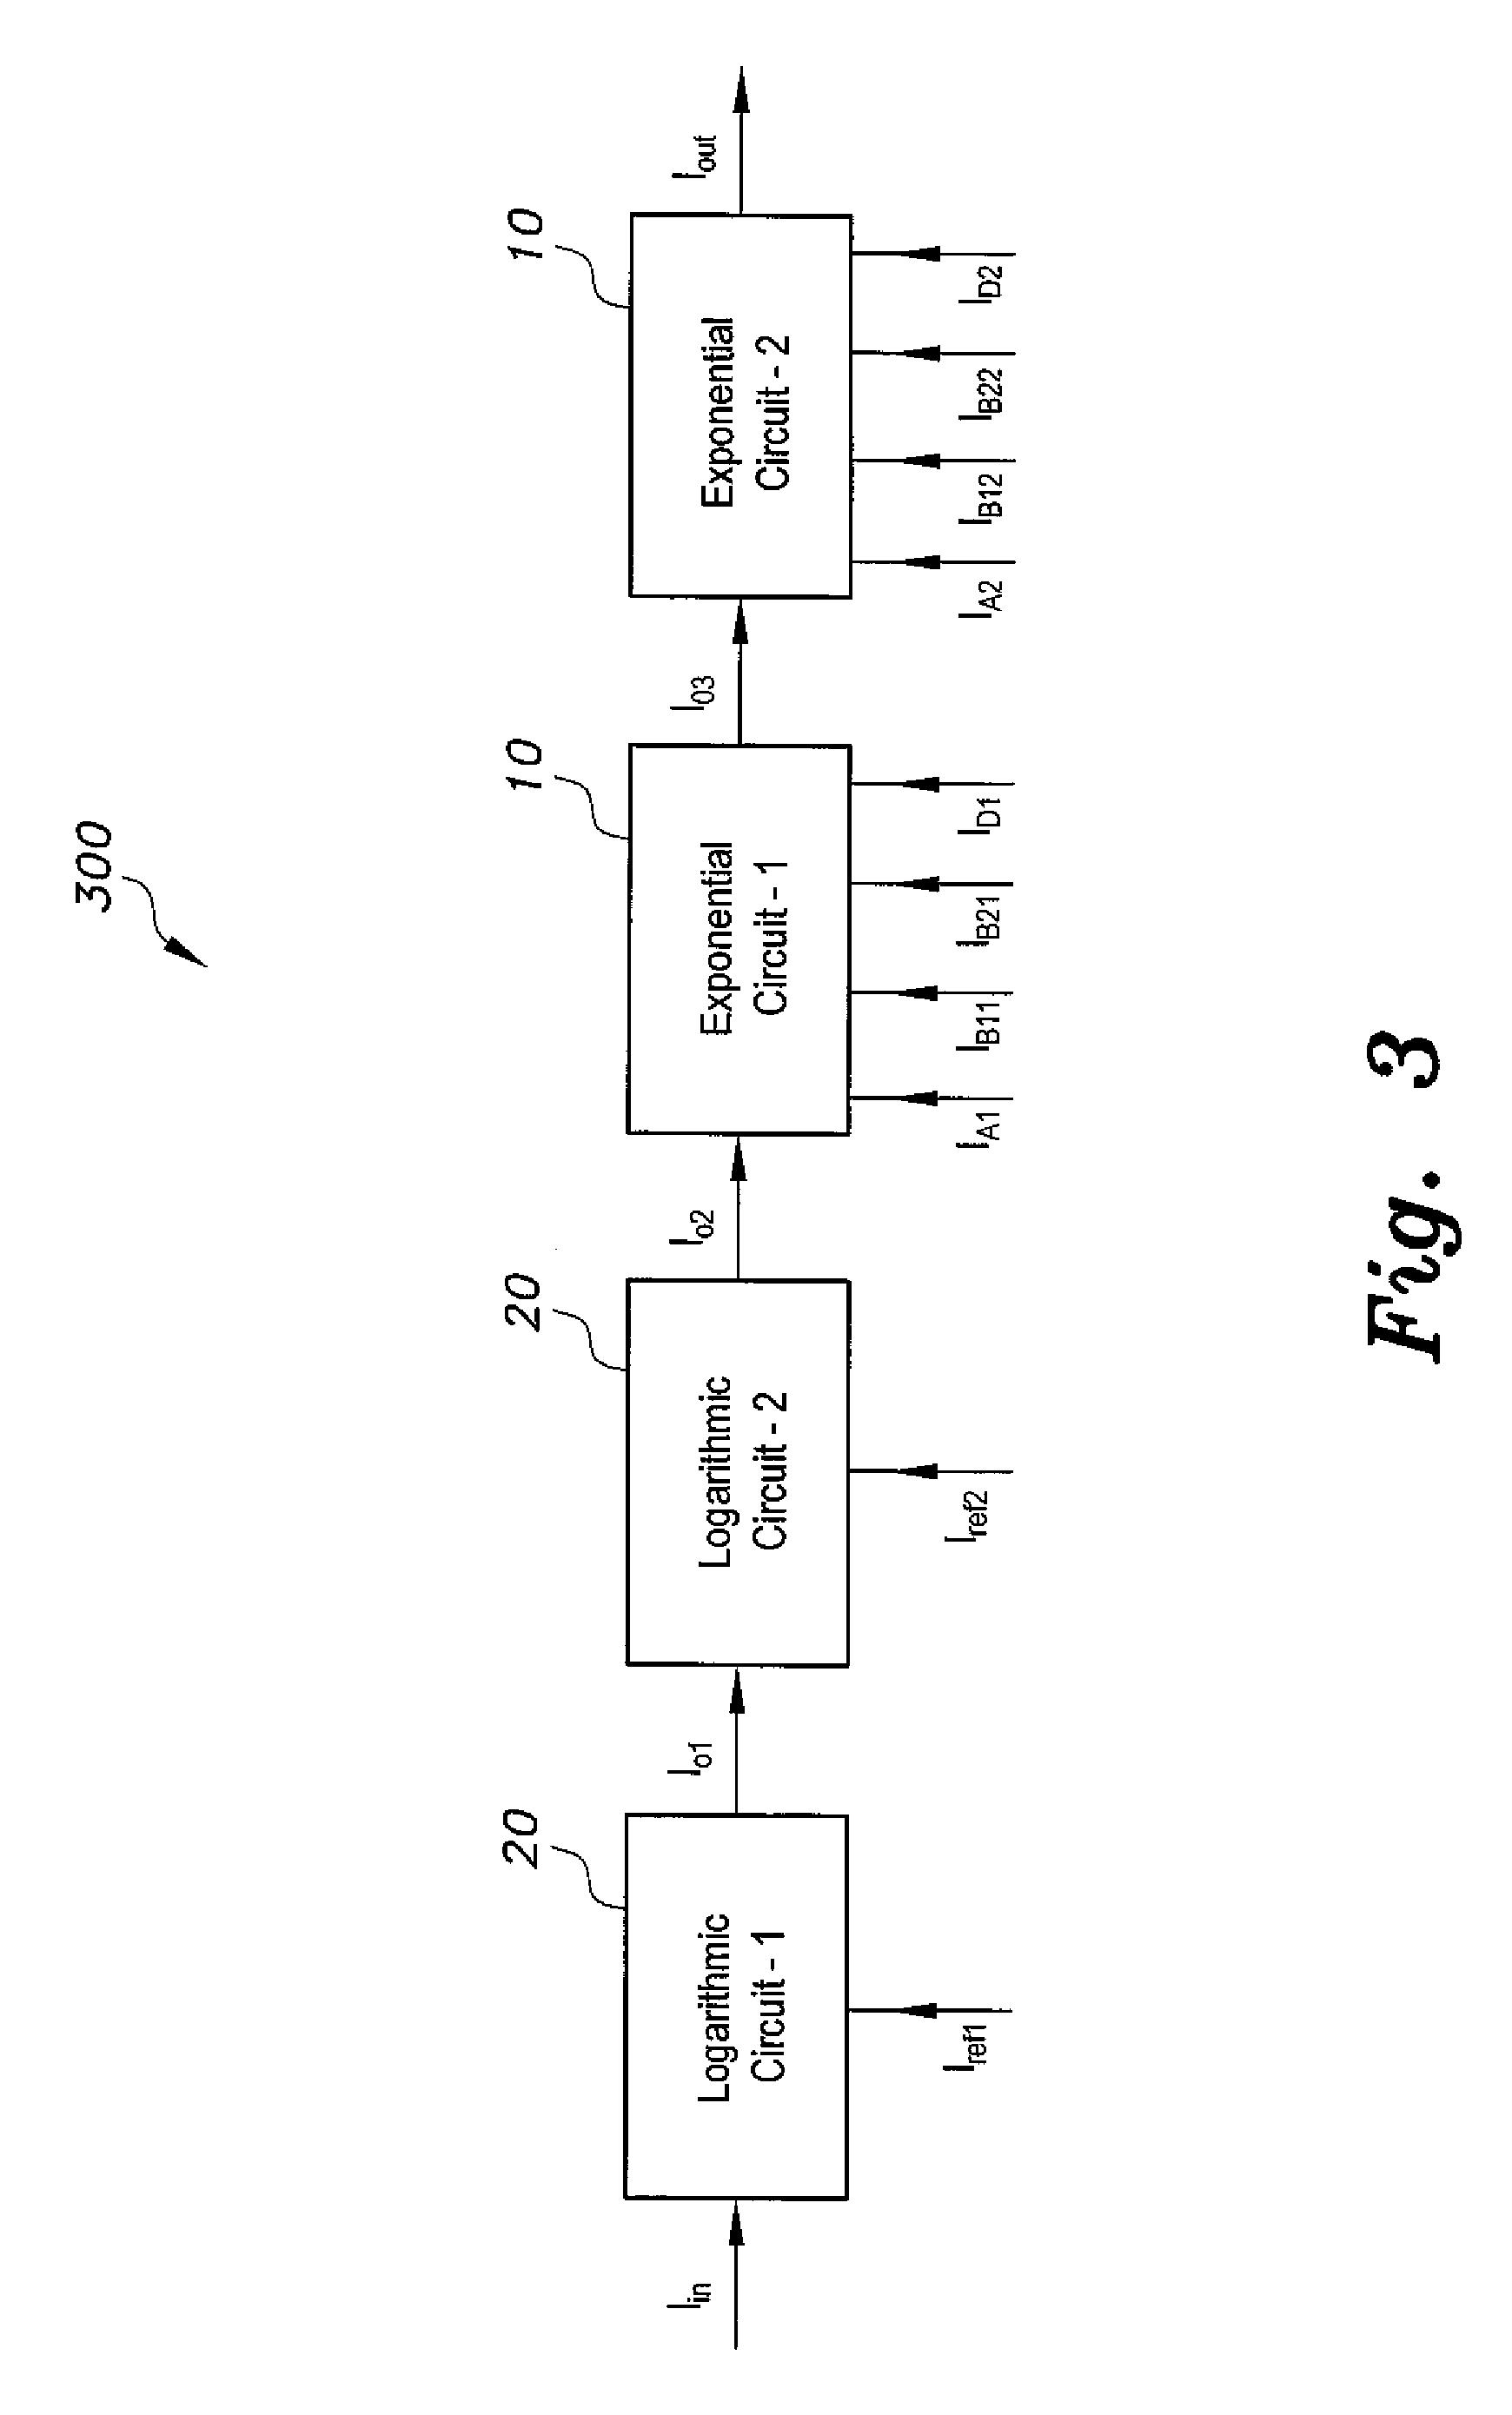 patent us8521802 - arbitrary power law function generator